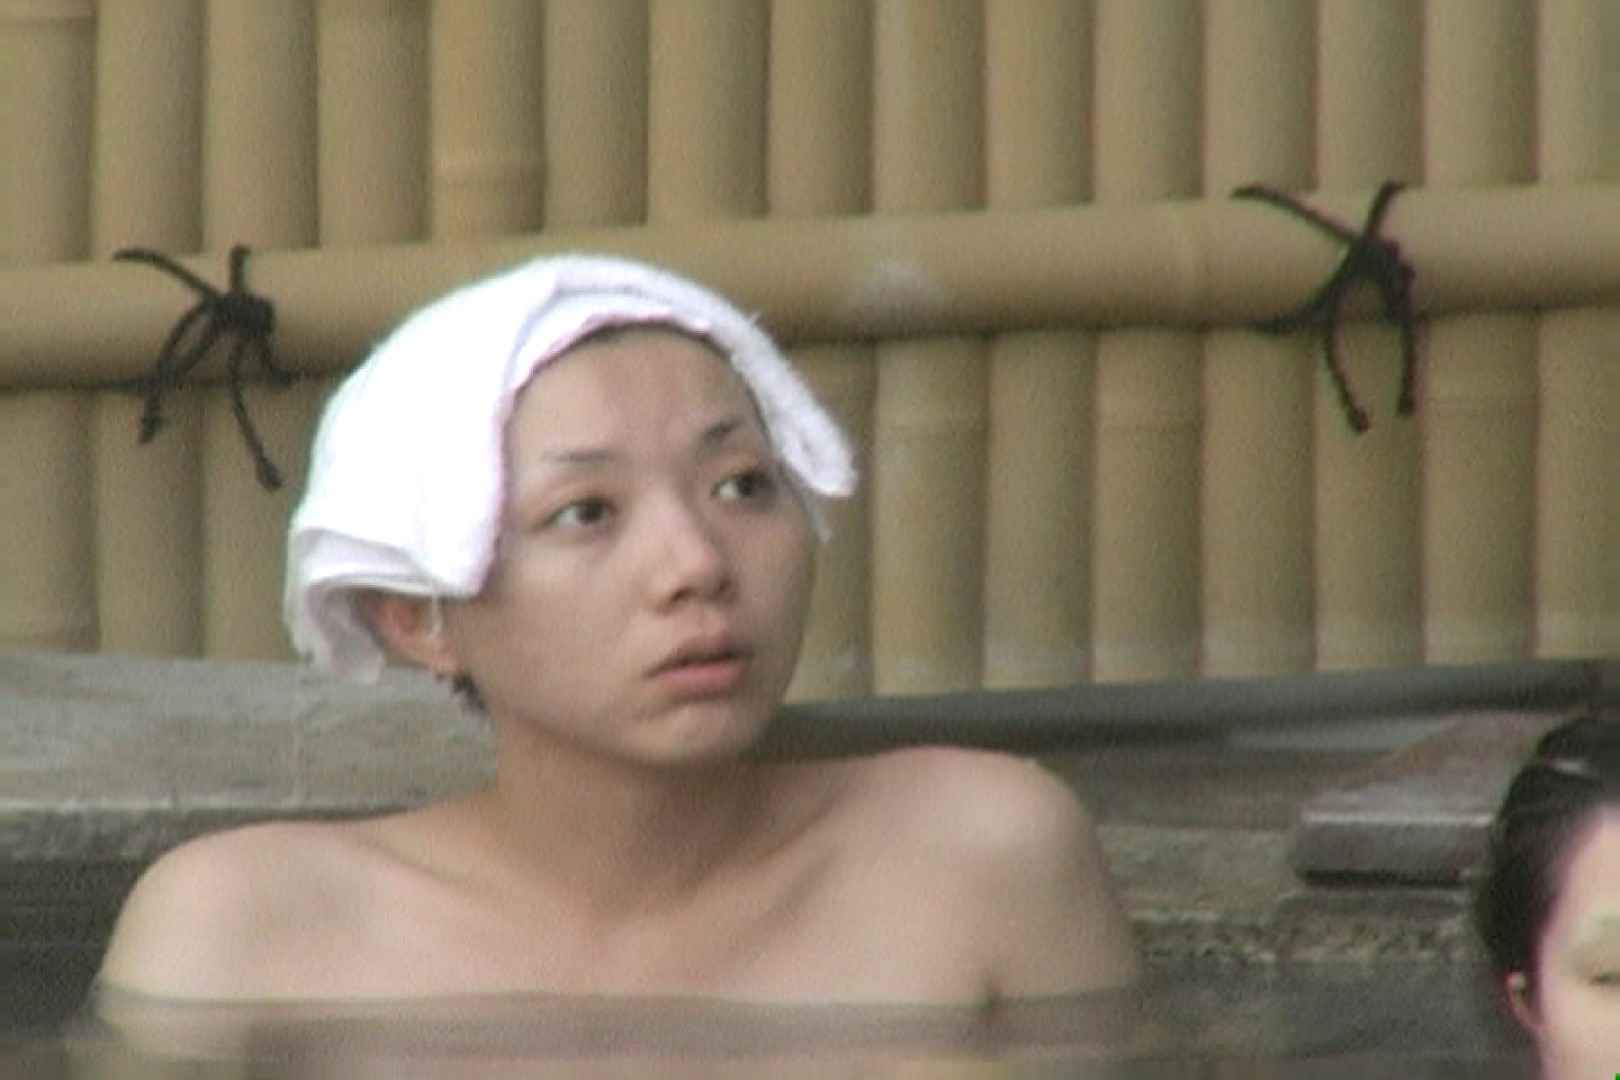 Aquaな露天風呂Vol.630 露天 セックス無修正動画無料 87pic 7